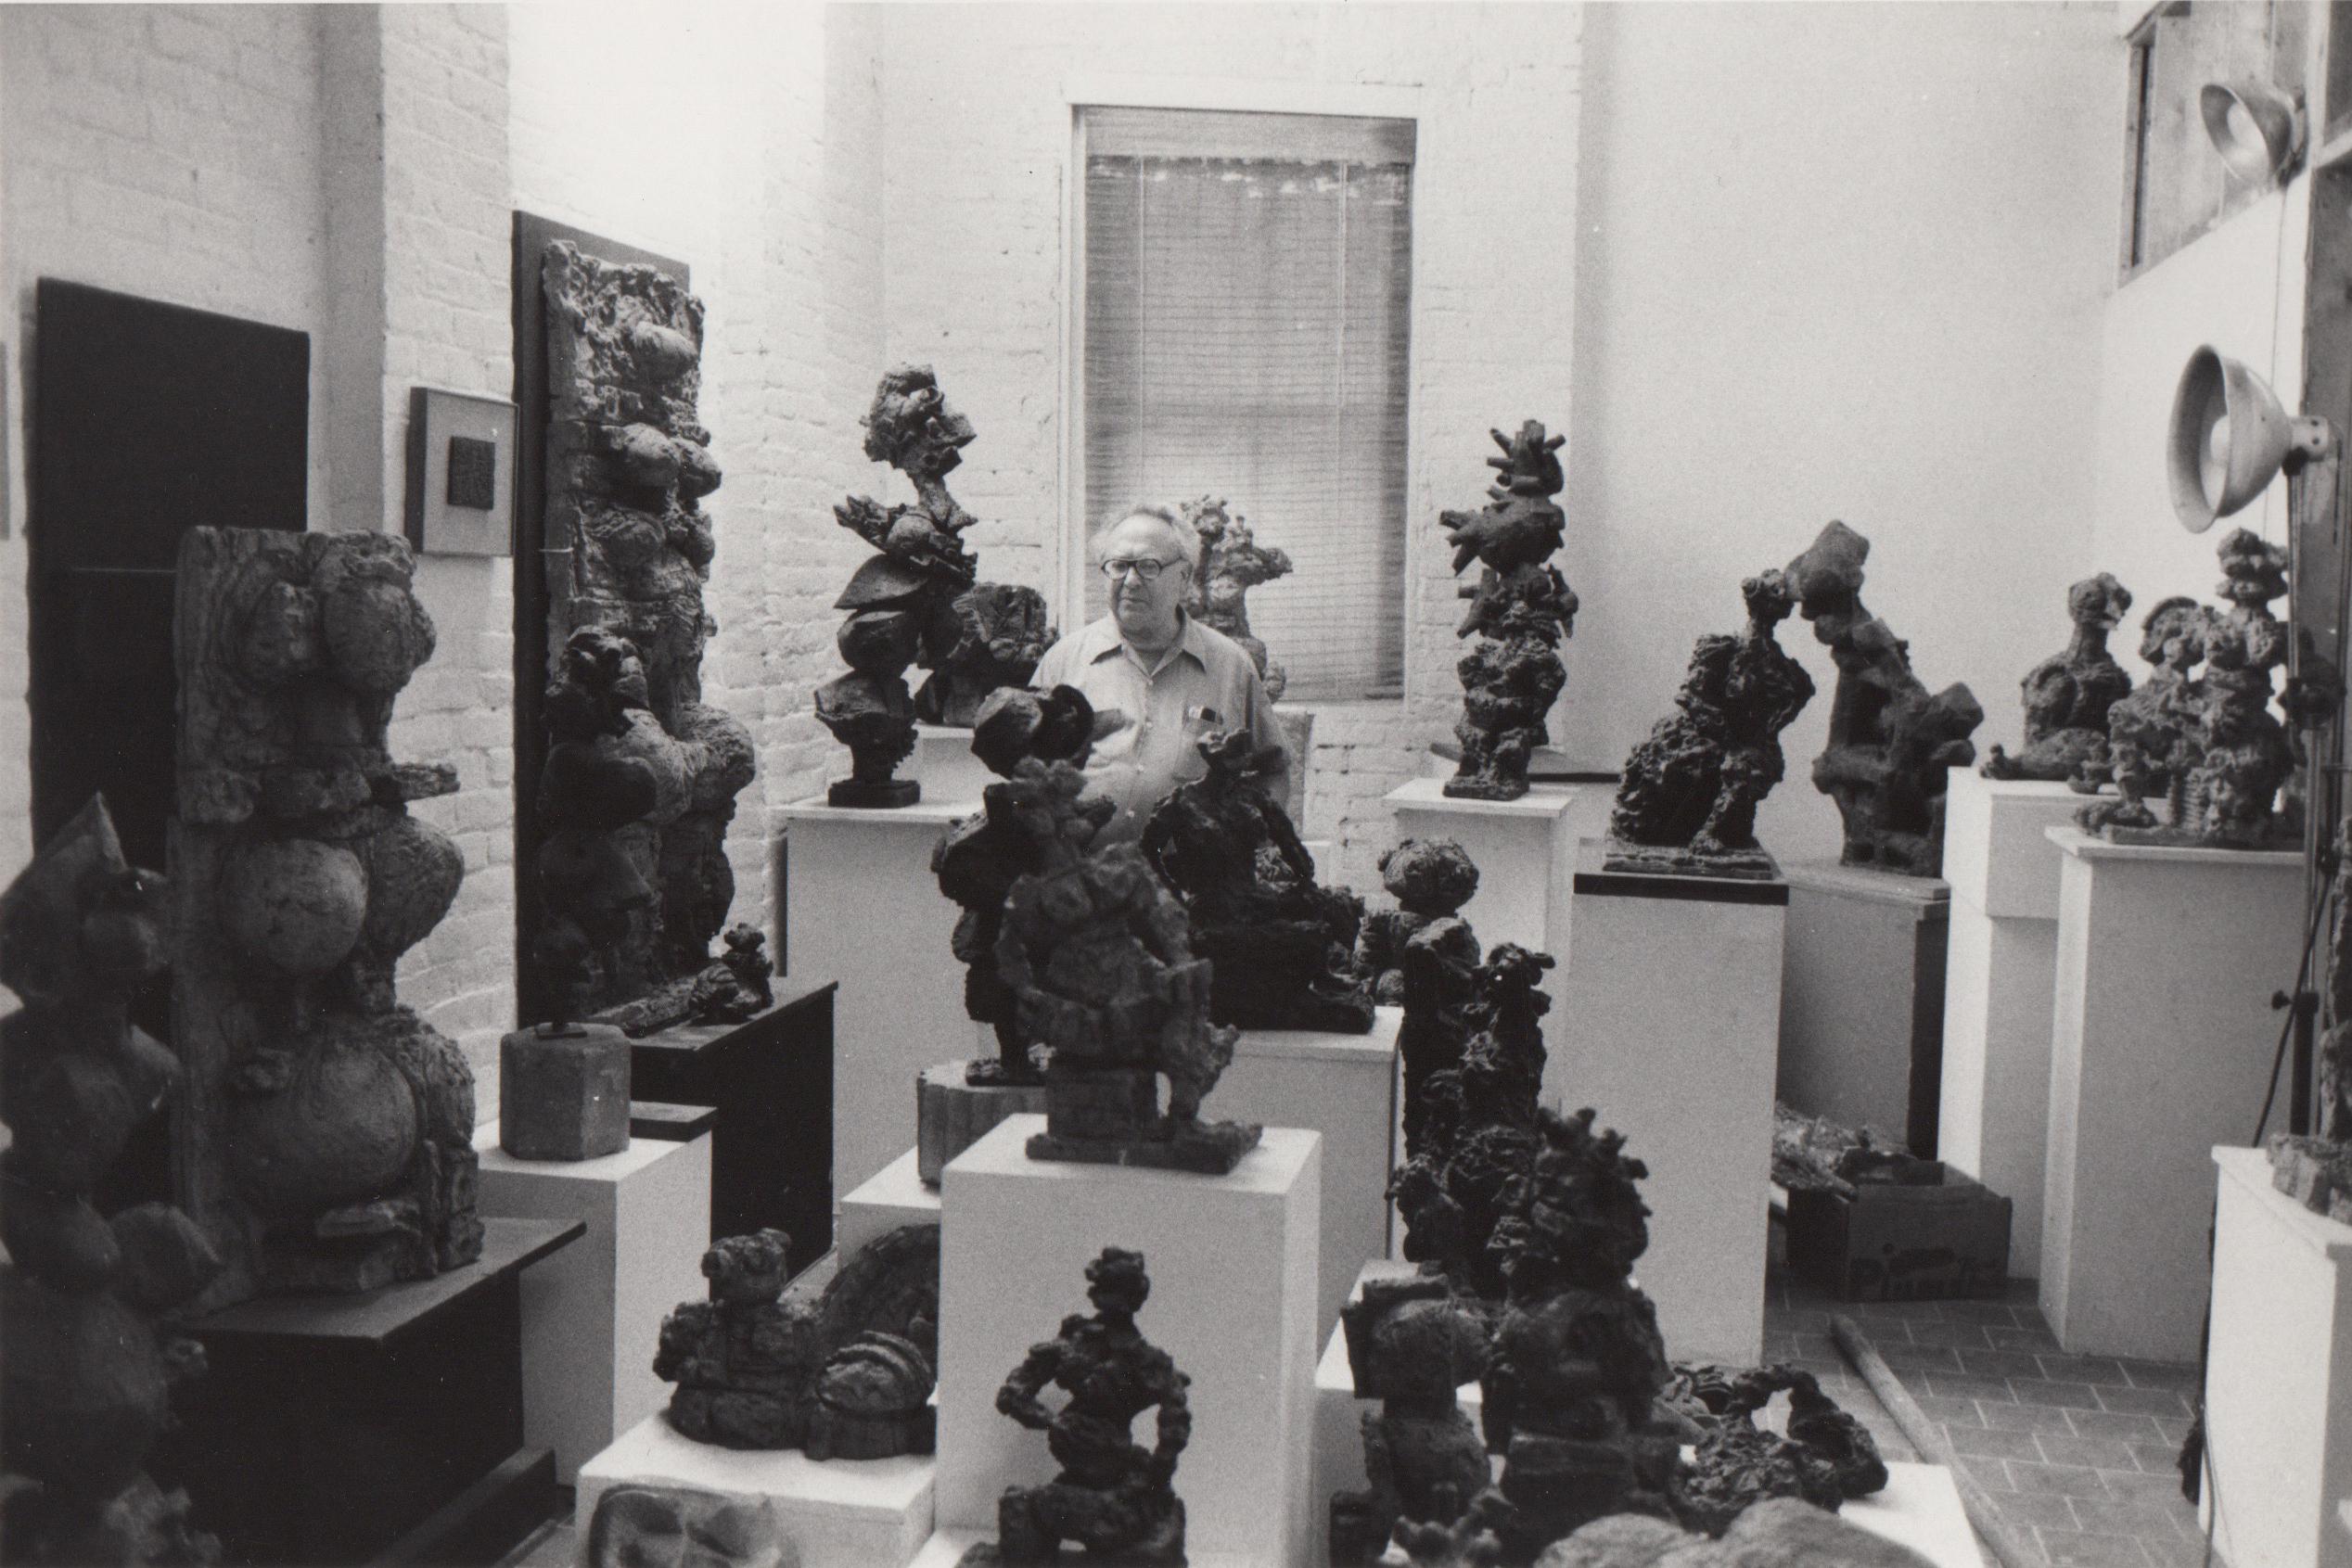 Reuben Kadish in his 9th street studio. photo: Sarah Wells